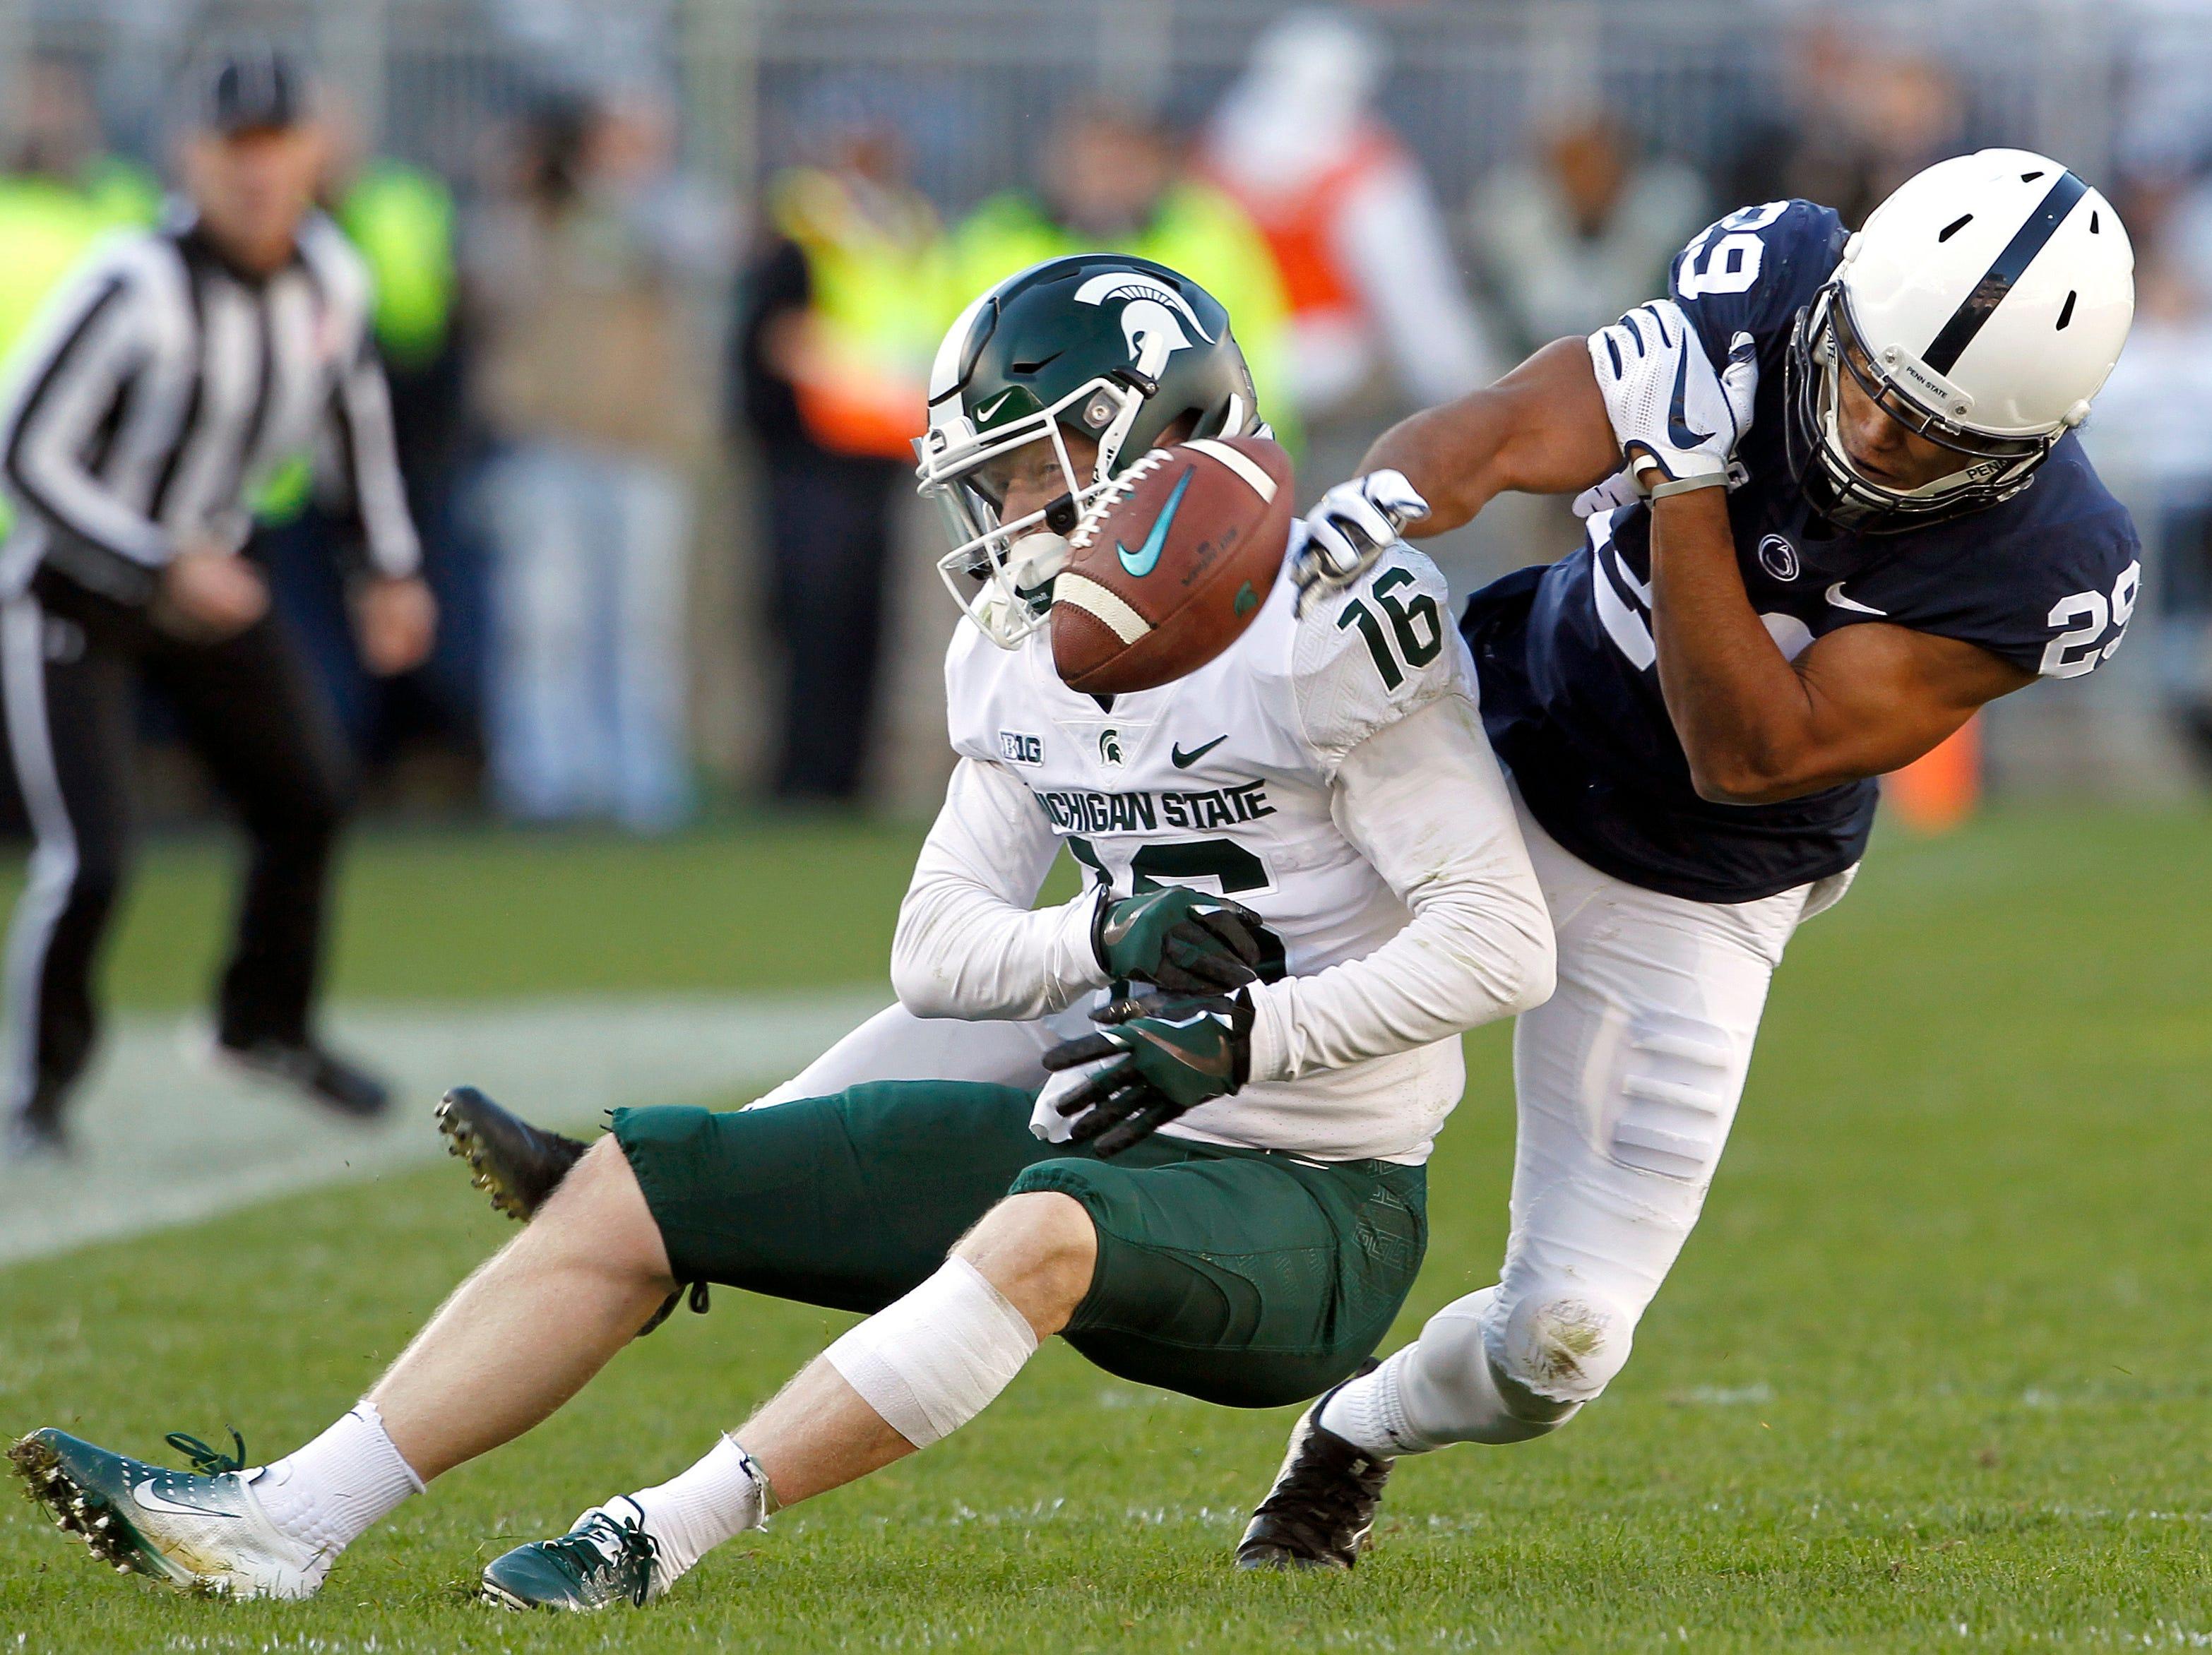 Penn State's John Reid breaks up a pass intended for Michigan State's Brandon Sowards.